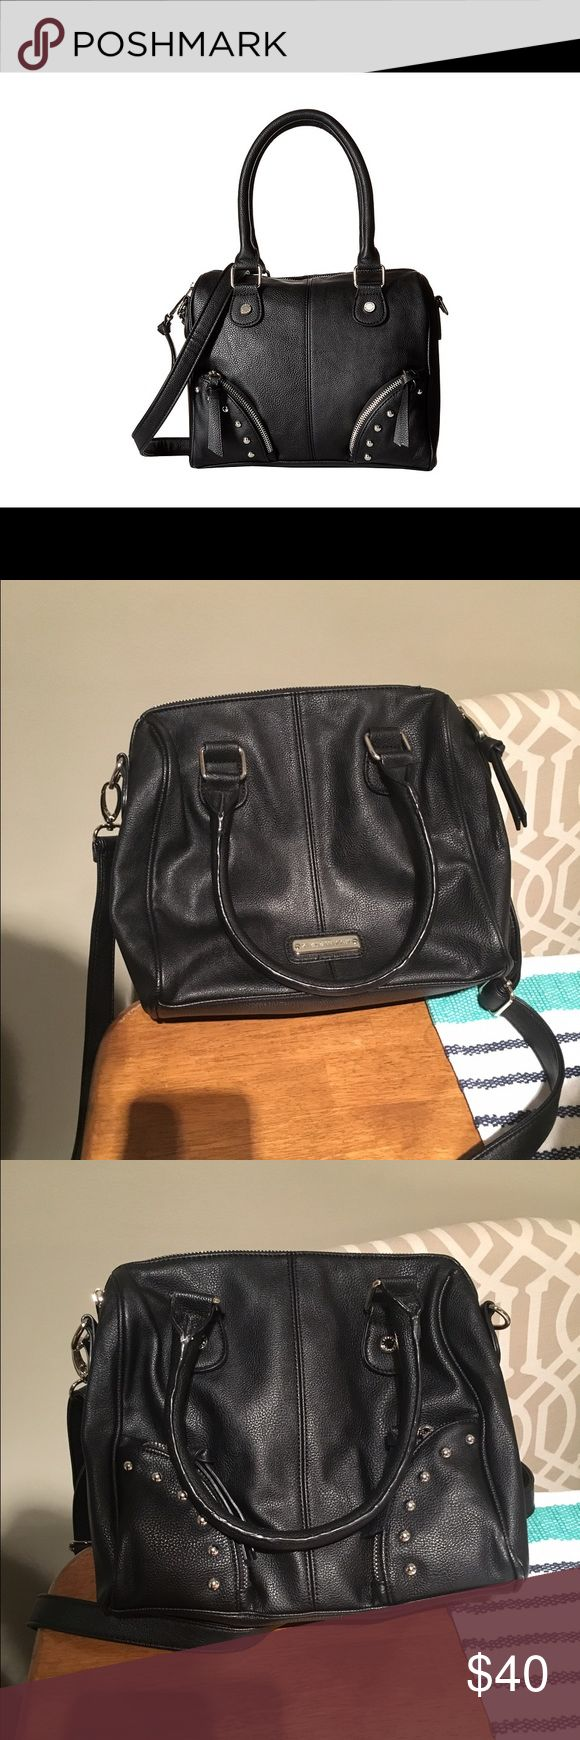 Steve Madden Mini Crossbody Handbag Black faux leather, Steve Madden, Black pebble color, perfect size crossbody Steve Madden Bags Crossbody Bags